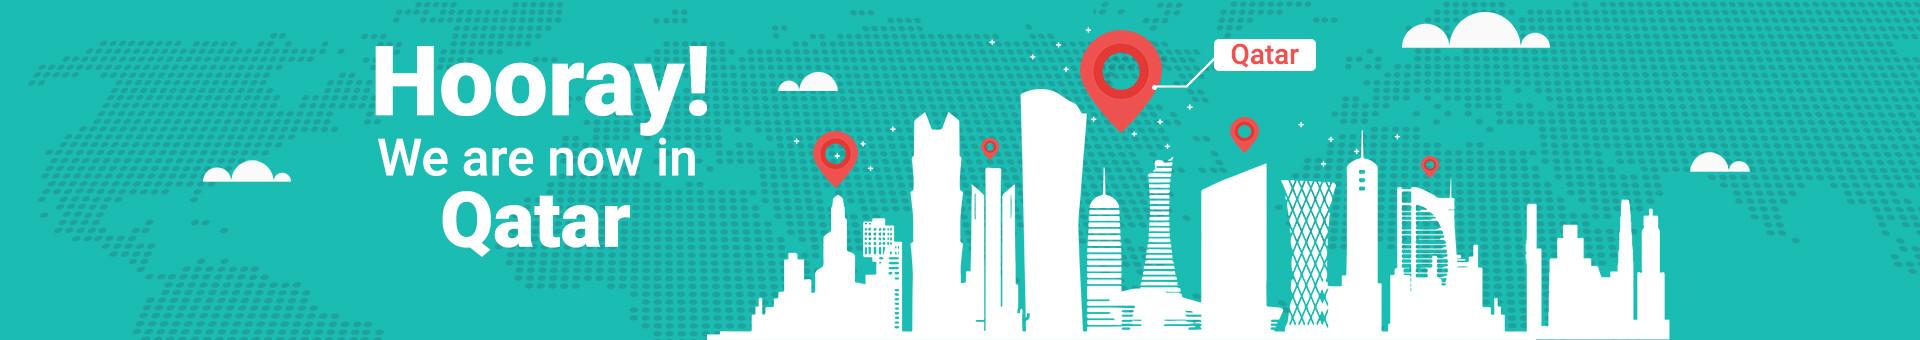 Storat Qatar